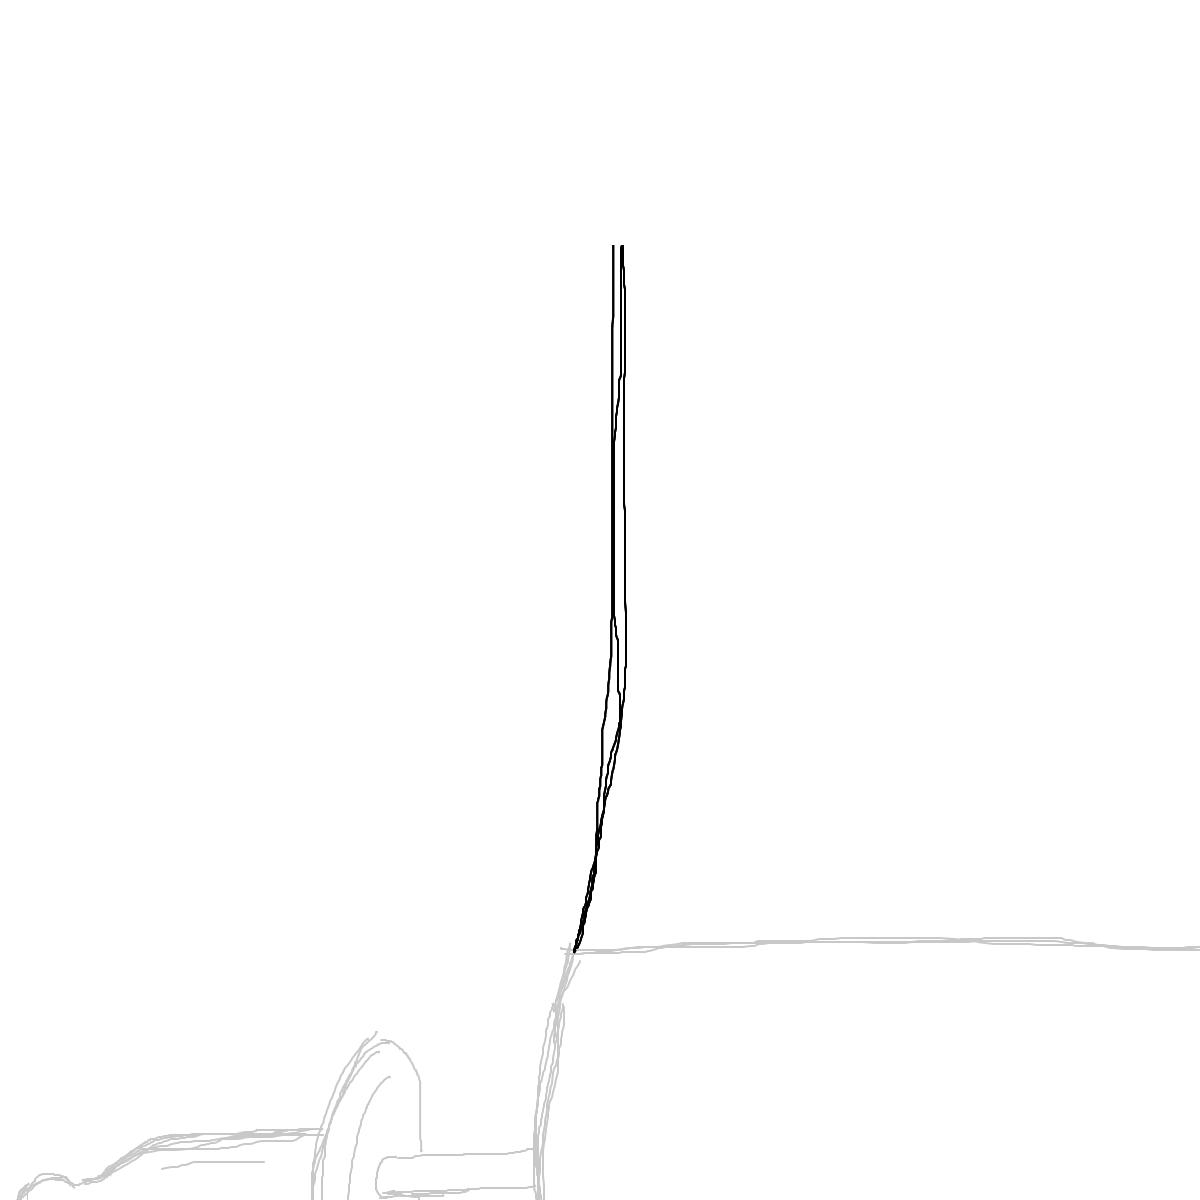 BAAAM drawing#10683 lat:51.0362892150878900lng: -114.0525131225586000